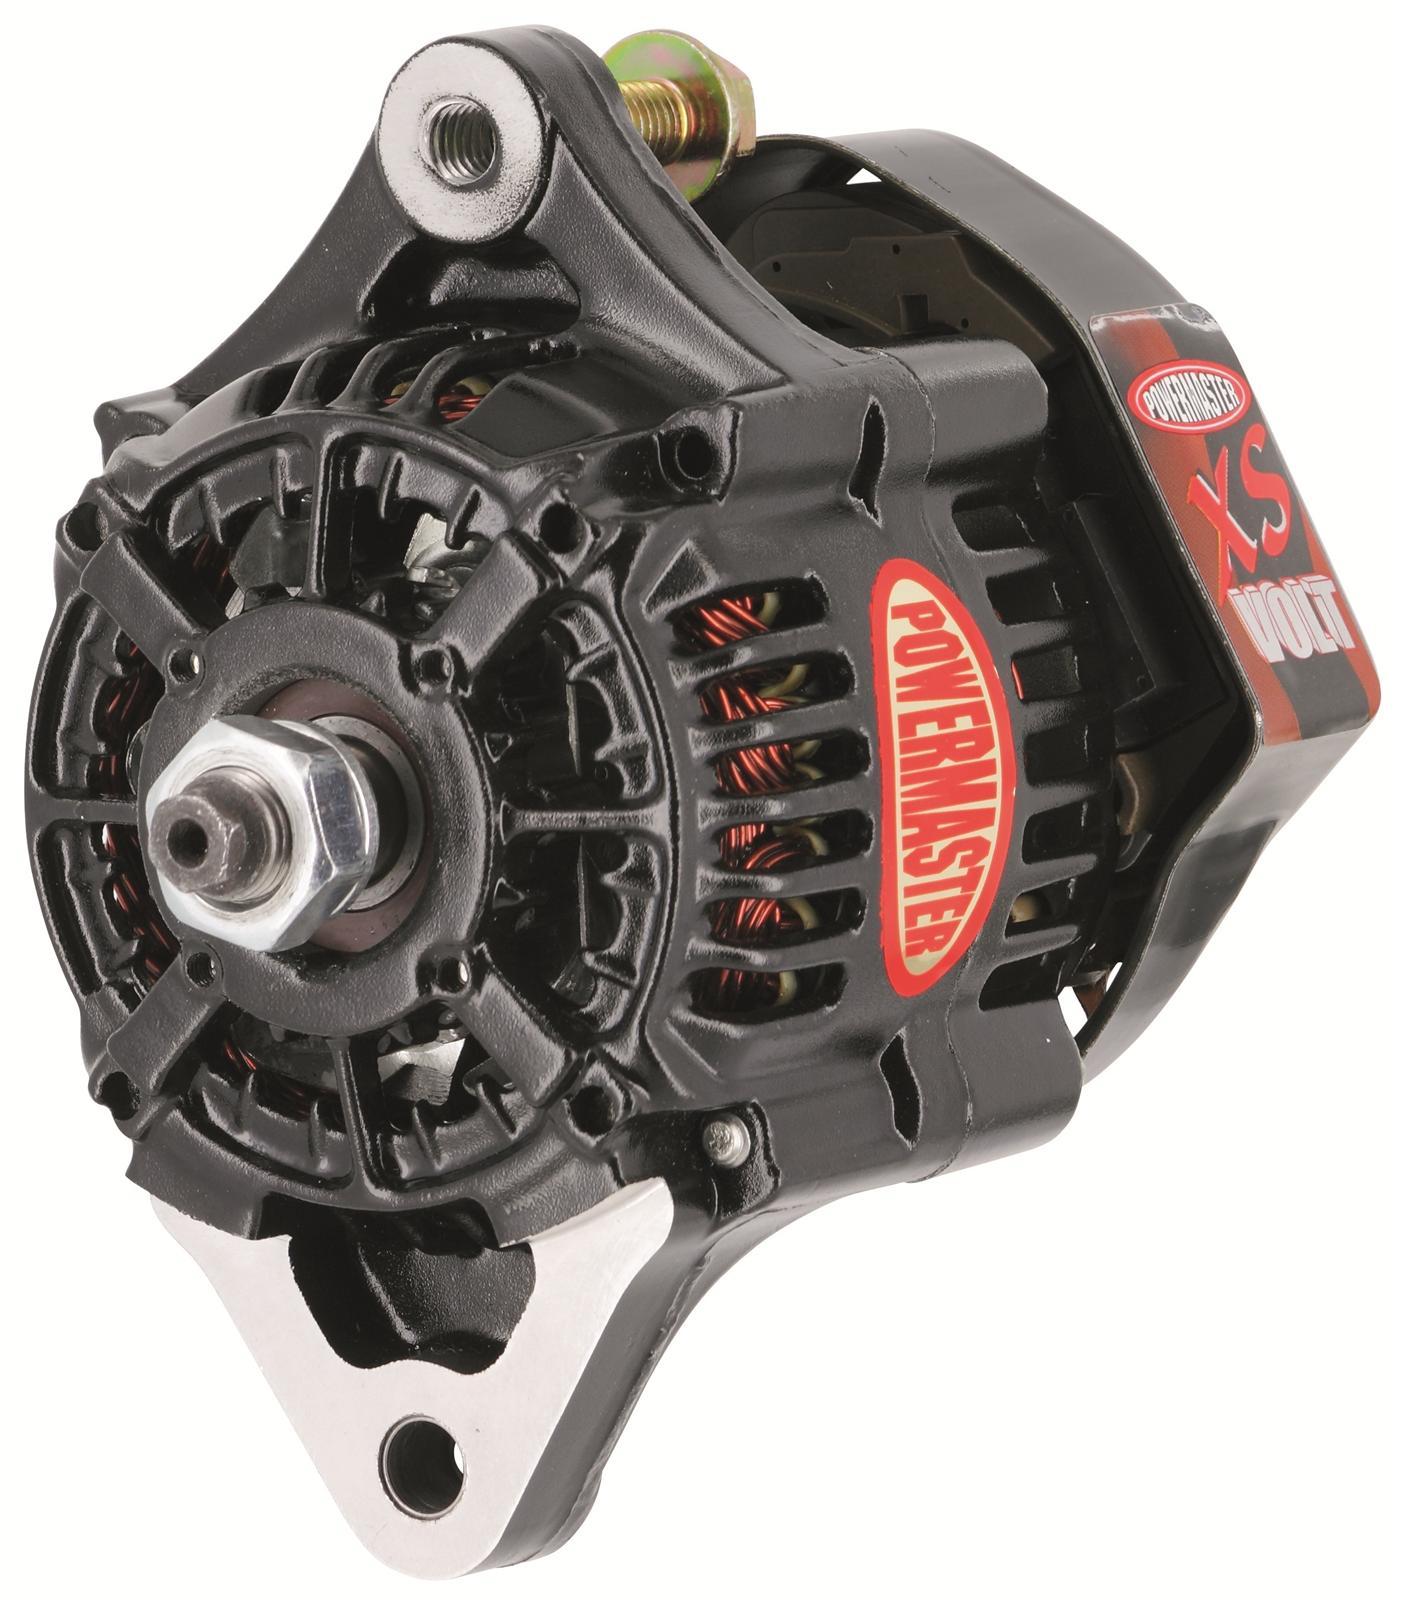 Denso 101211 1420 Suzuki Wiring Diagram Wiring Diagram Database \u2022 BMW  Alternator Diagram Denso 1420 Alternator 3 Wire Diagram